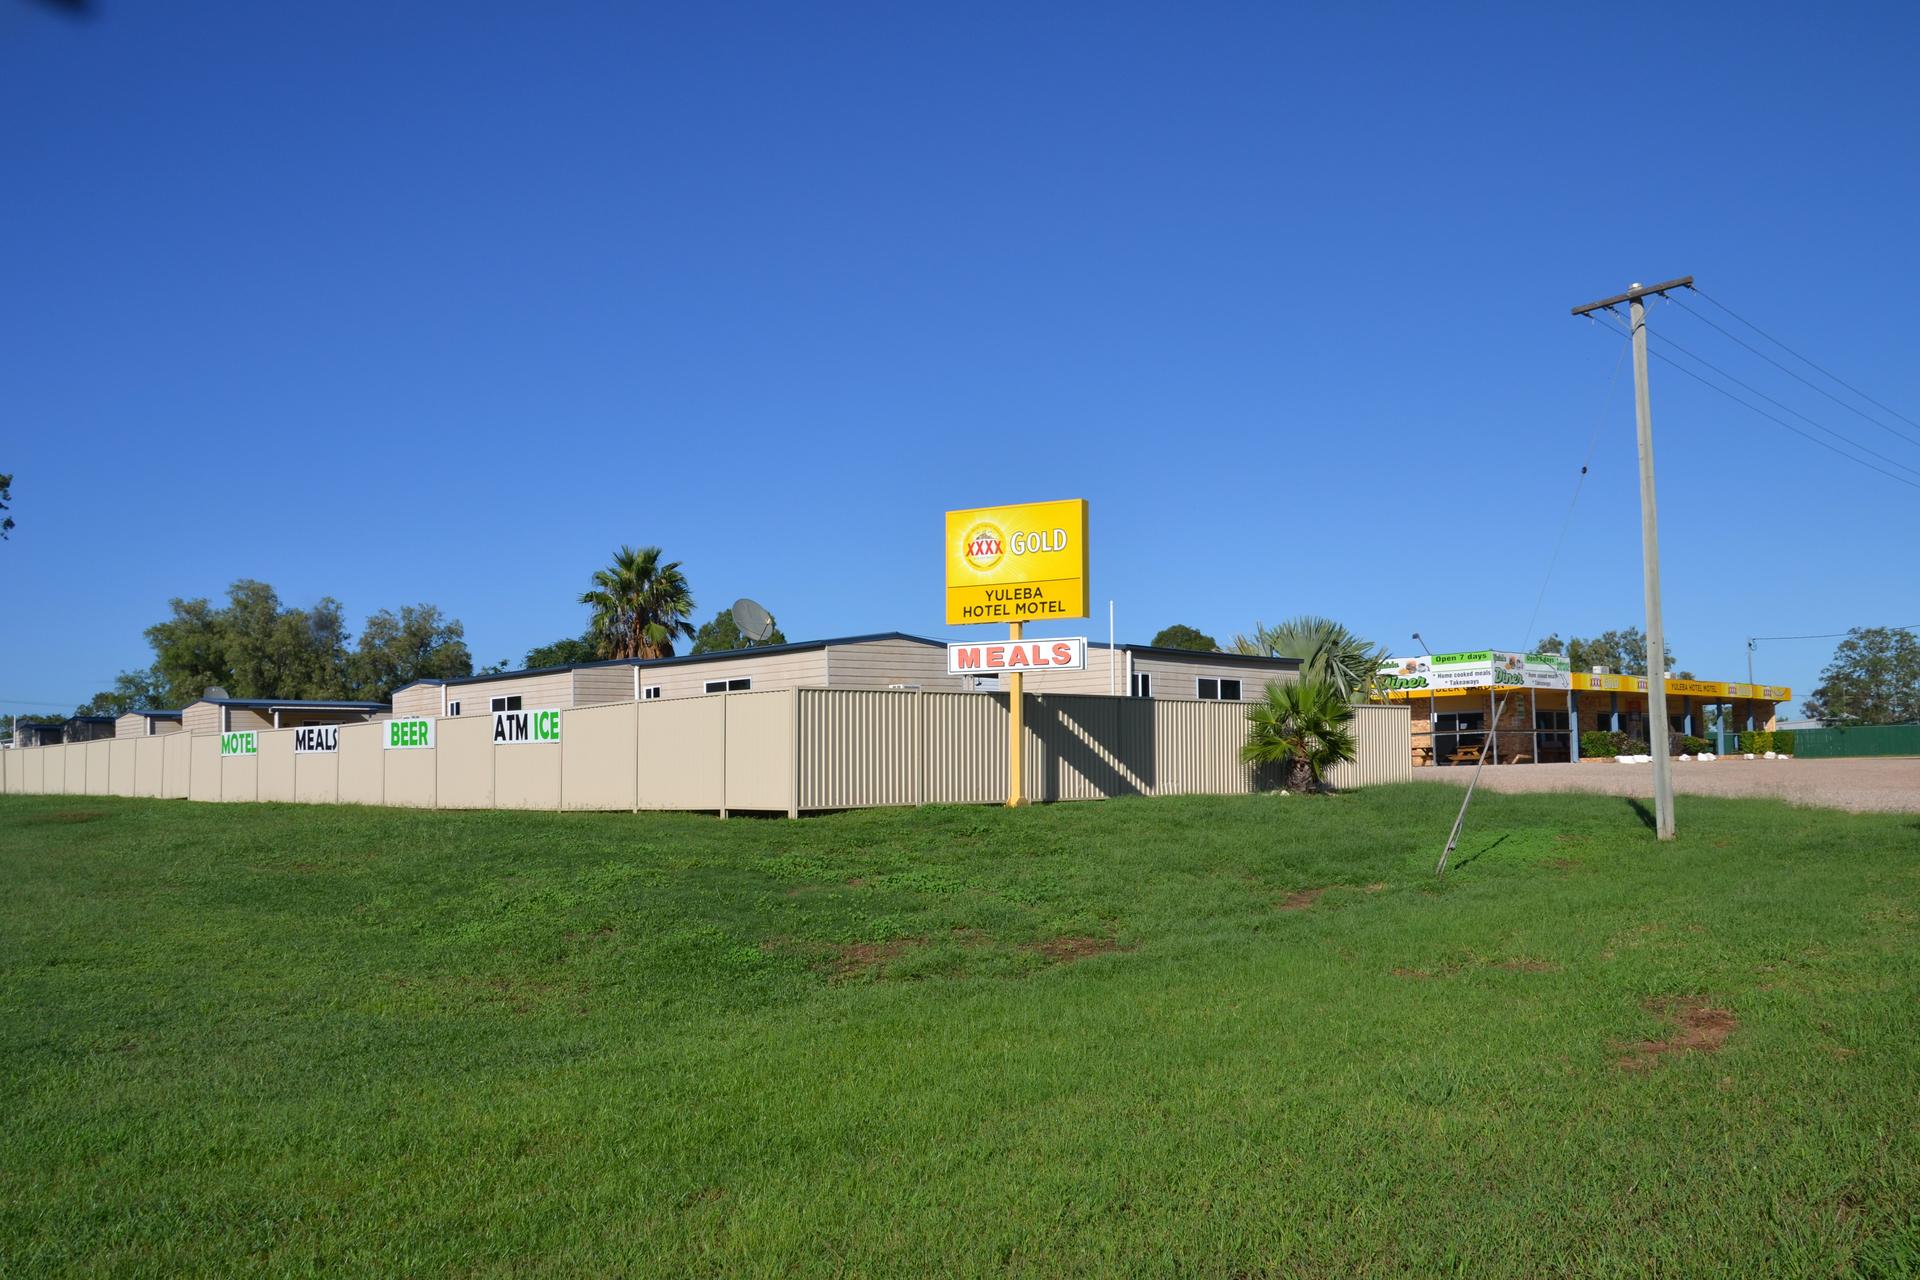 Yuleba Hotel Motel and Diner